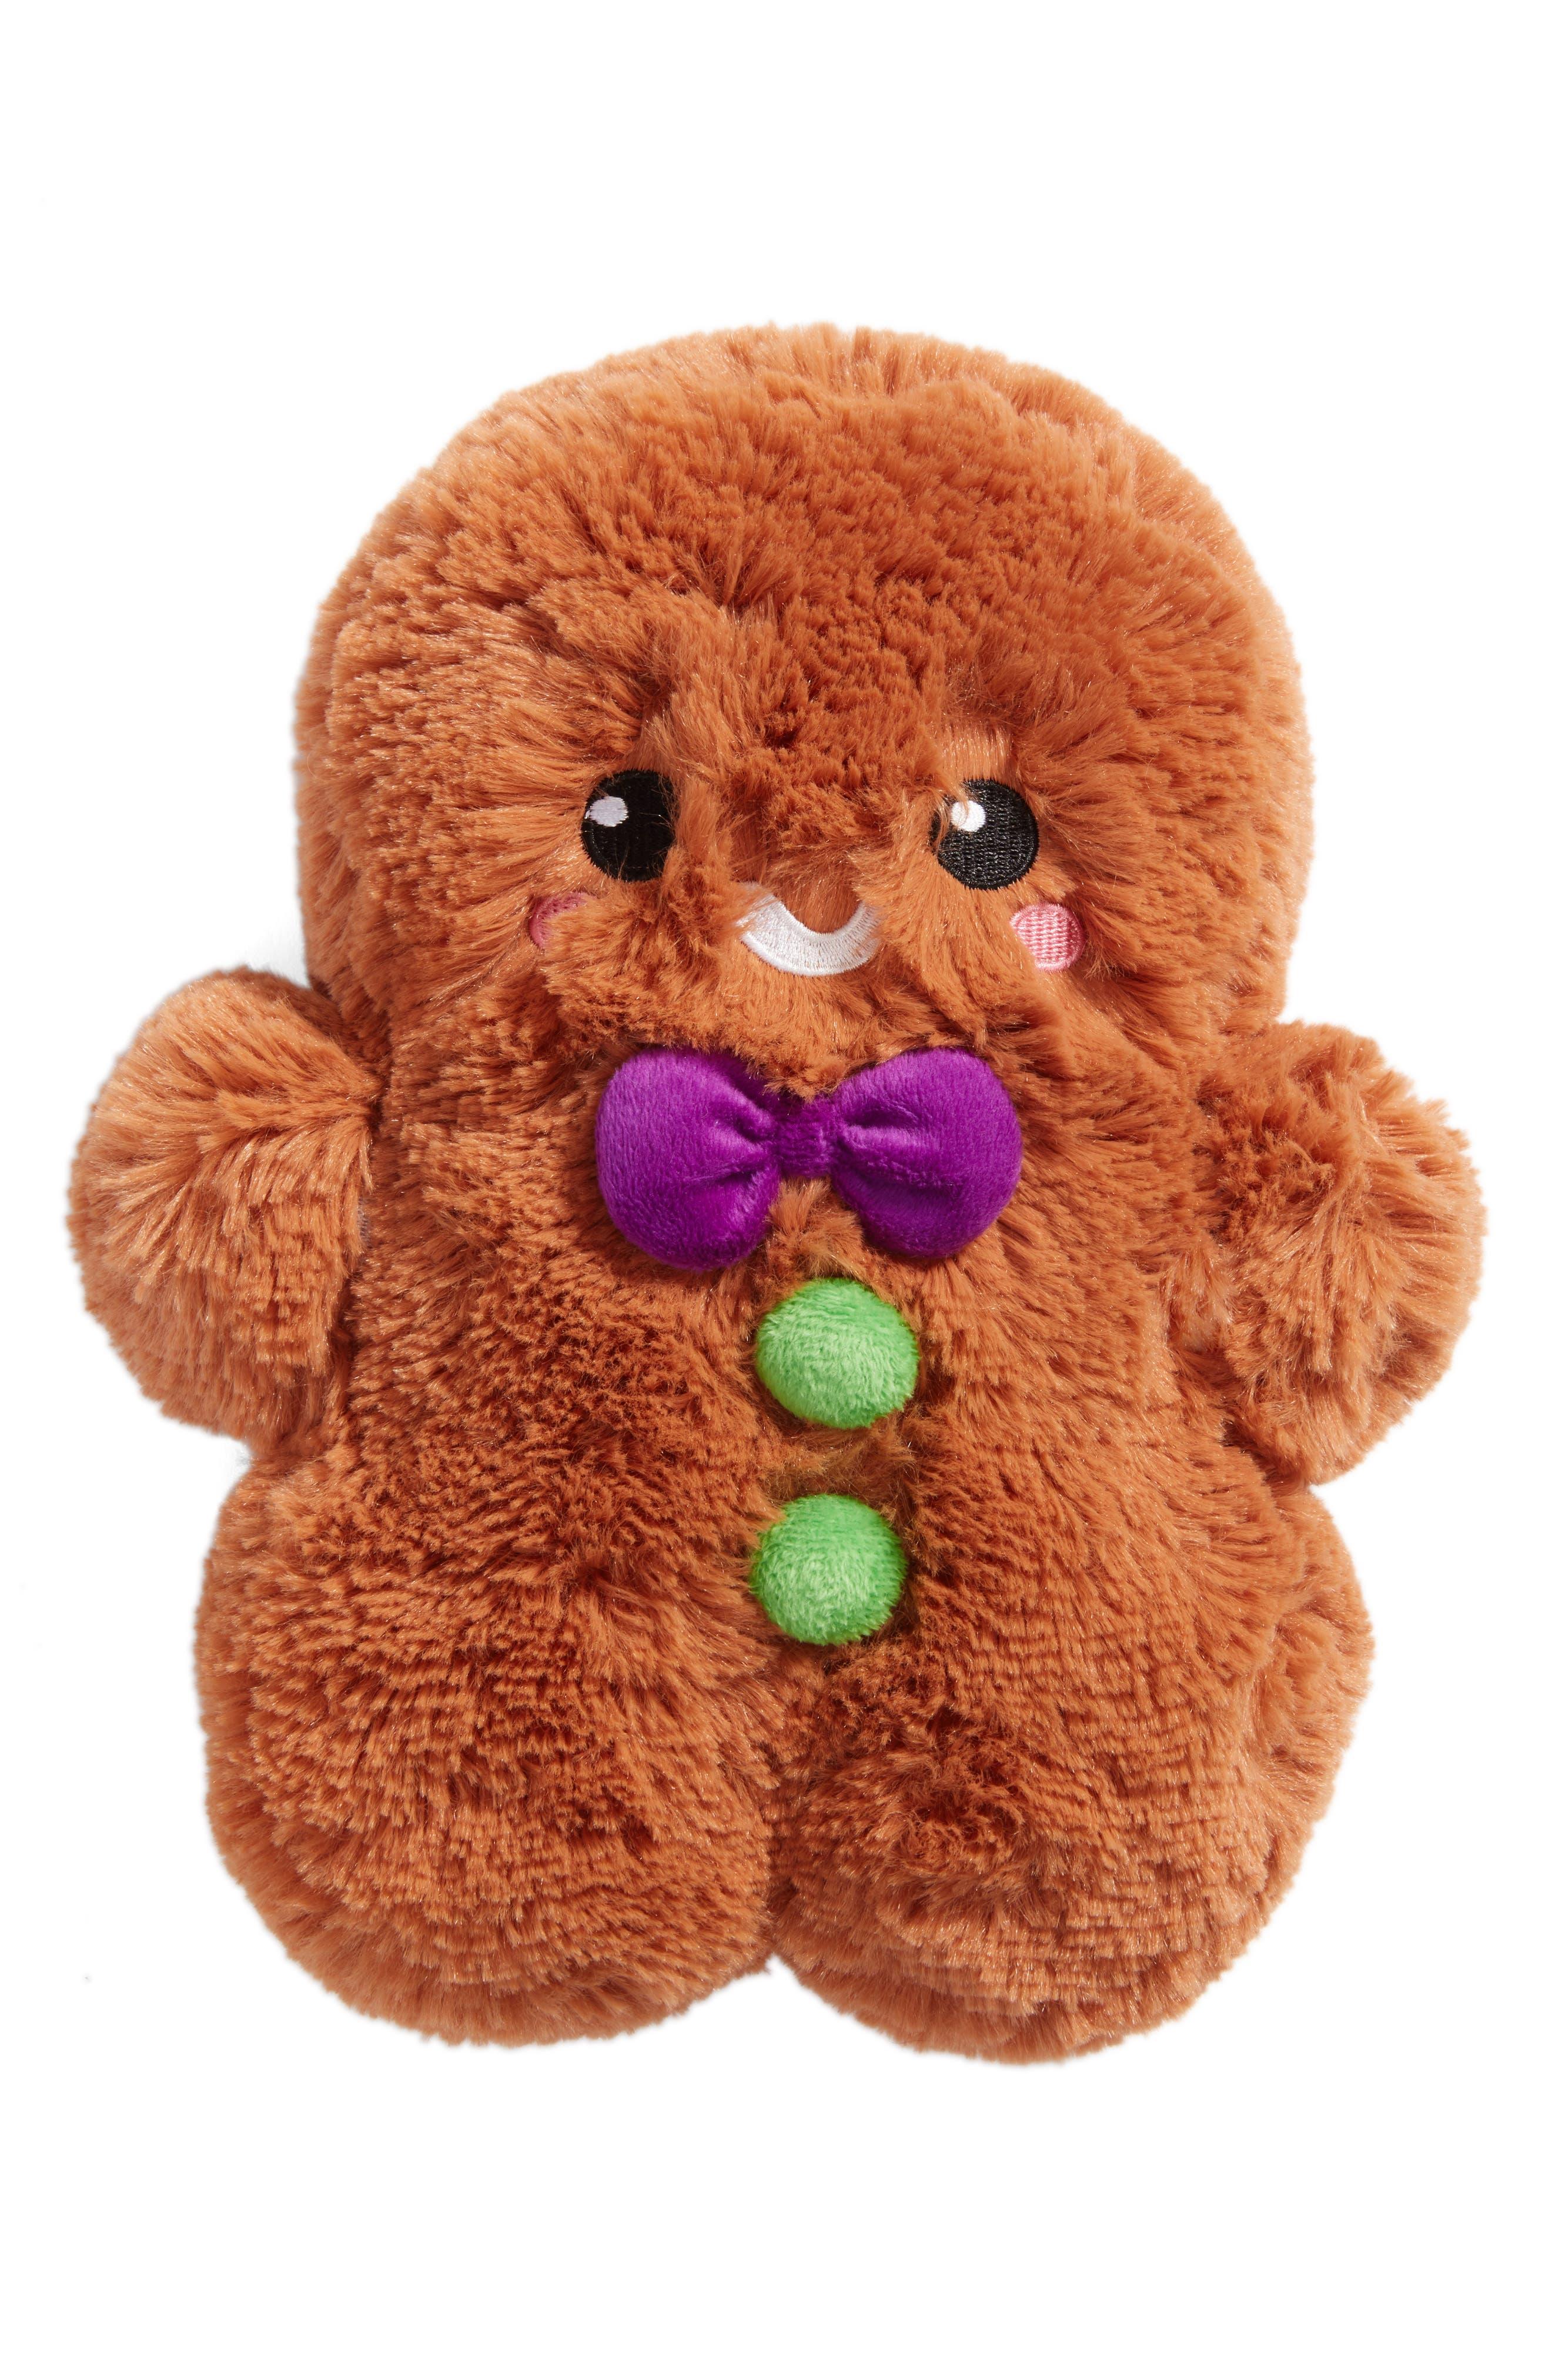 Main Image - Squishable Mini Gingerbread Man Stuffed Toy